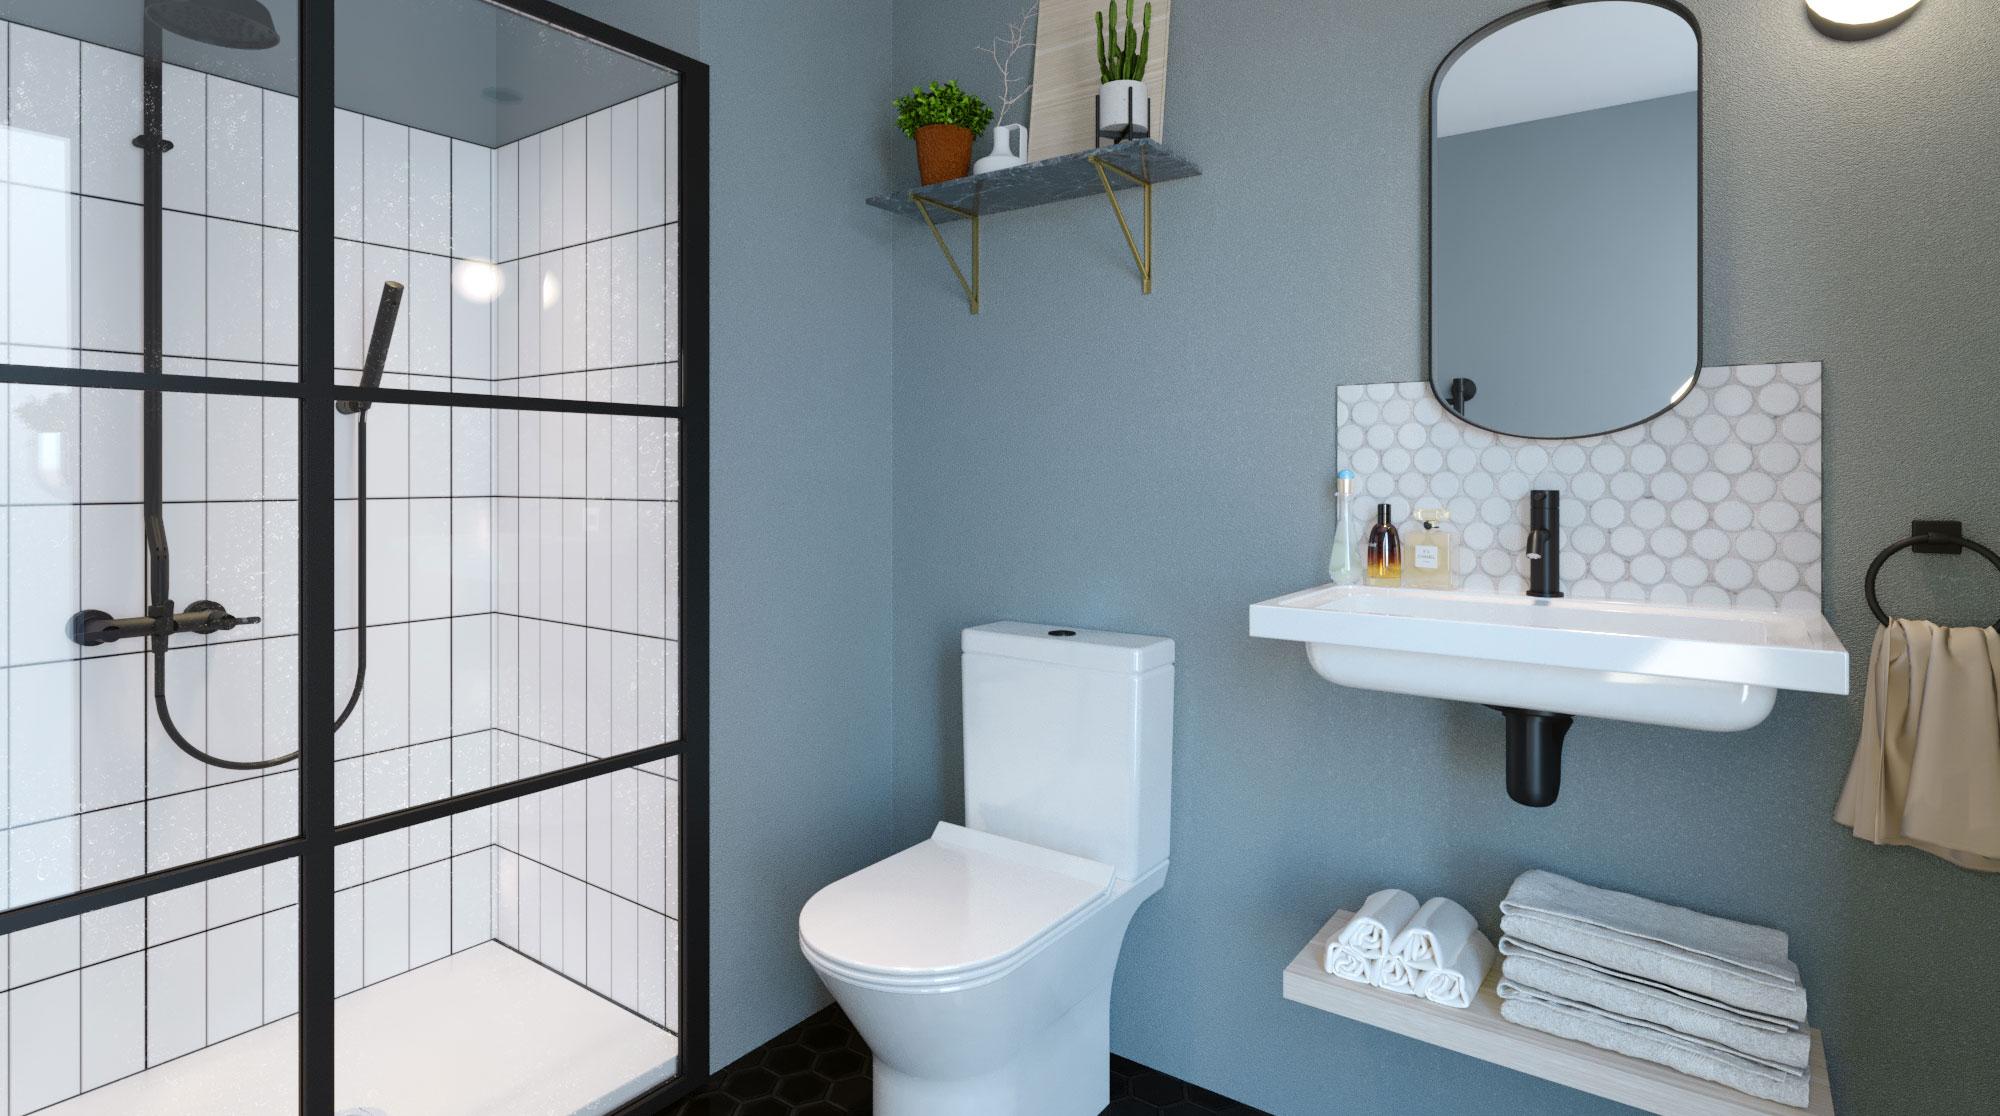 Bathrooms at Hy